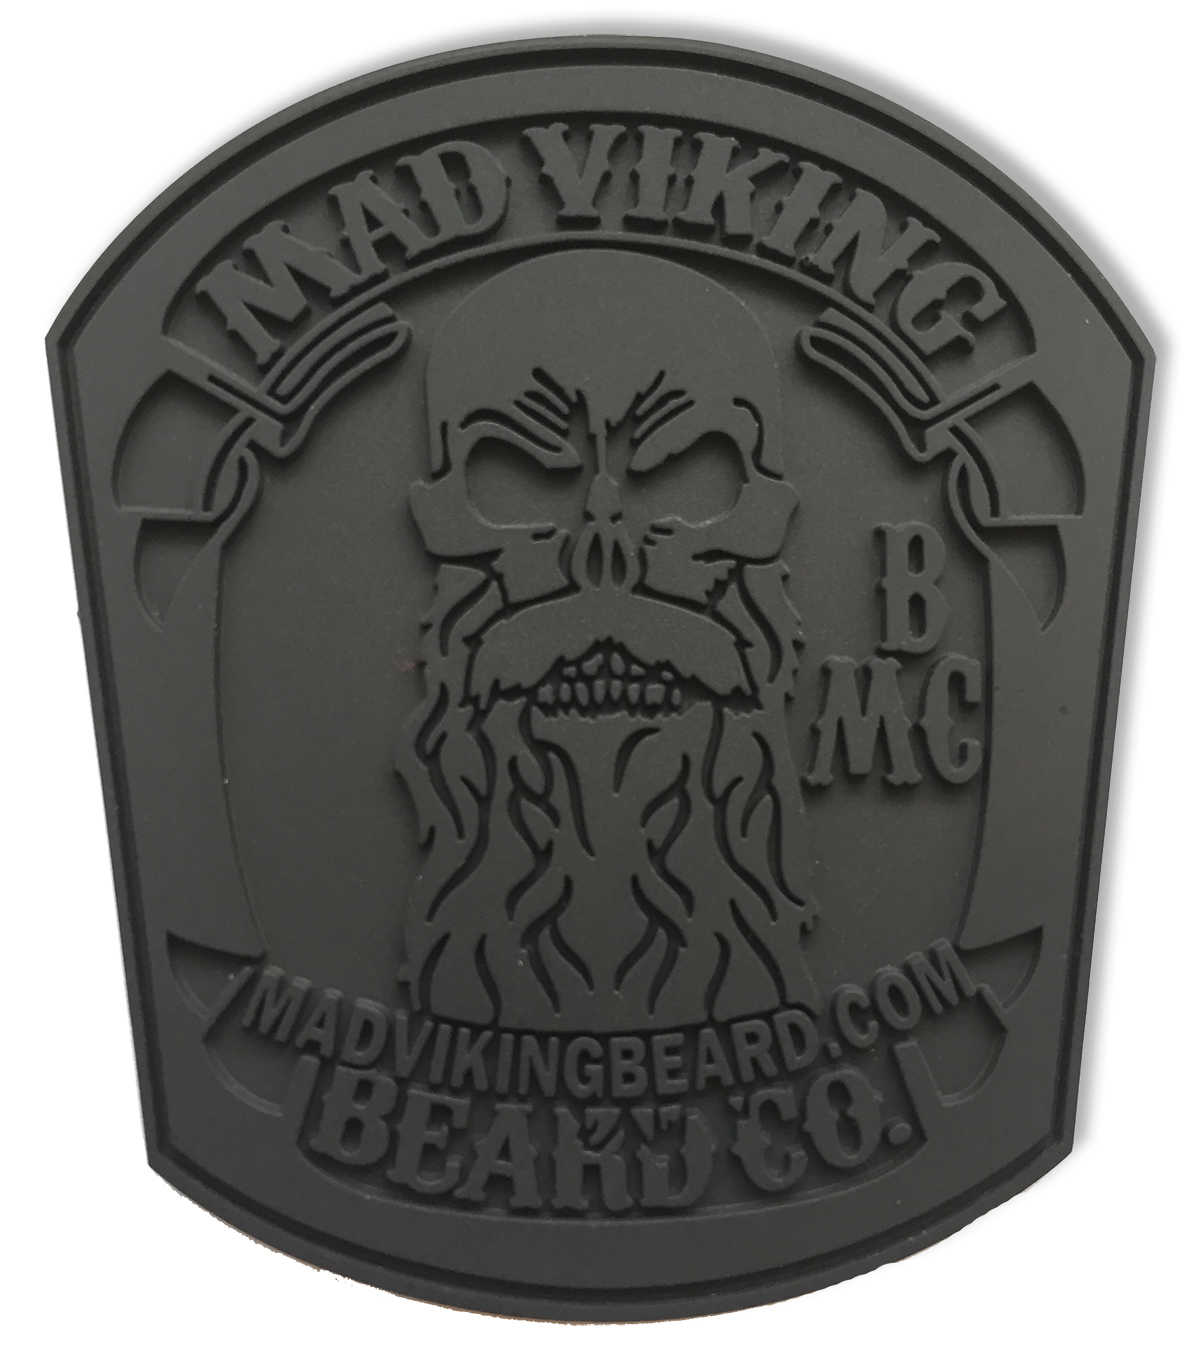 Mad Viking PVC Morale Patch